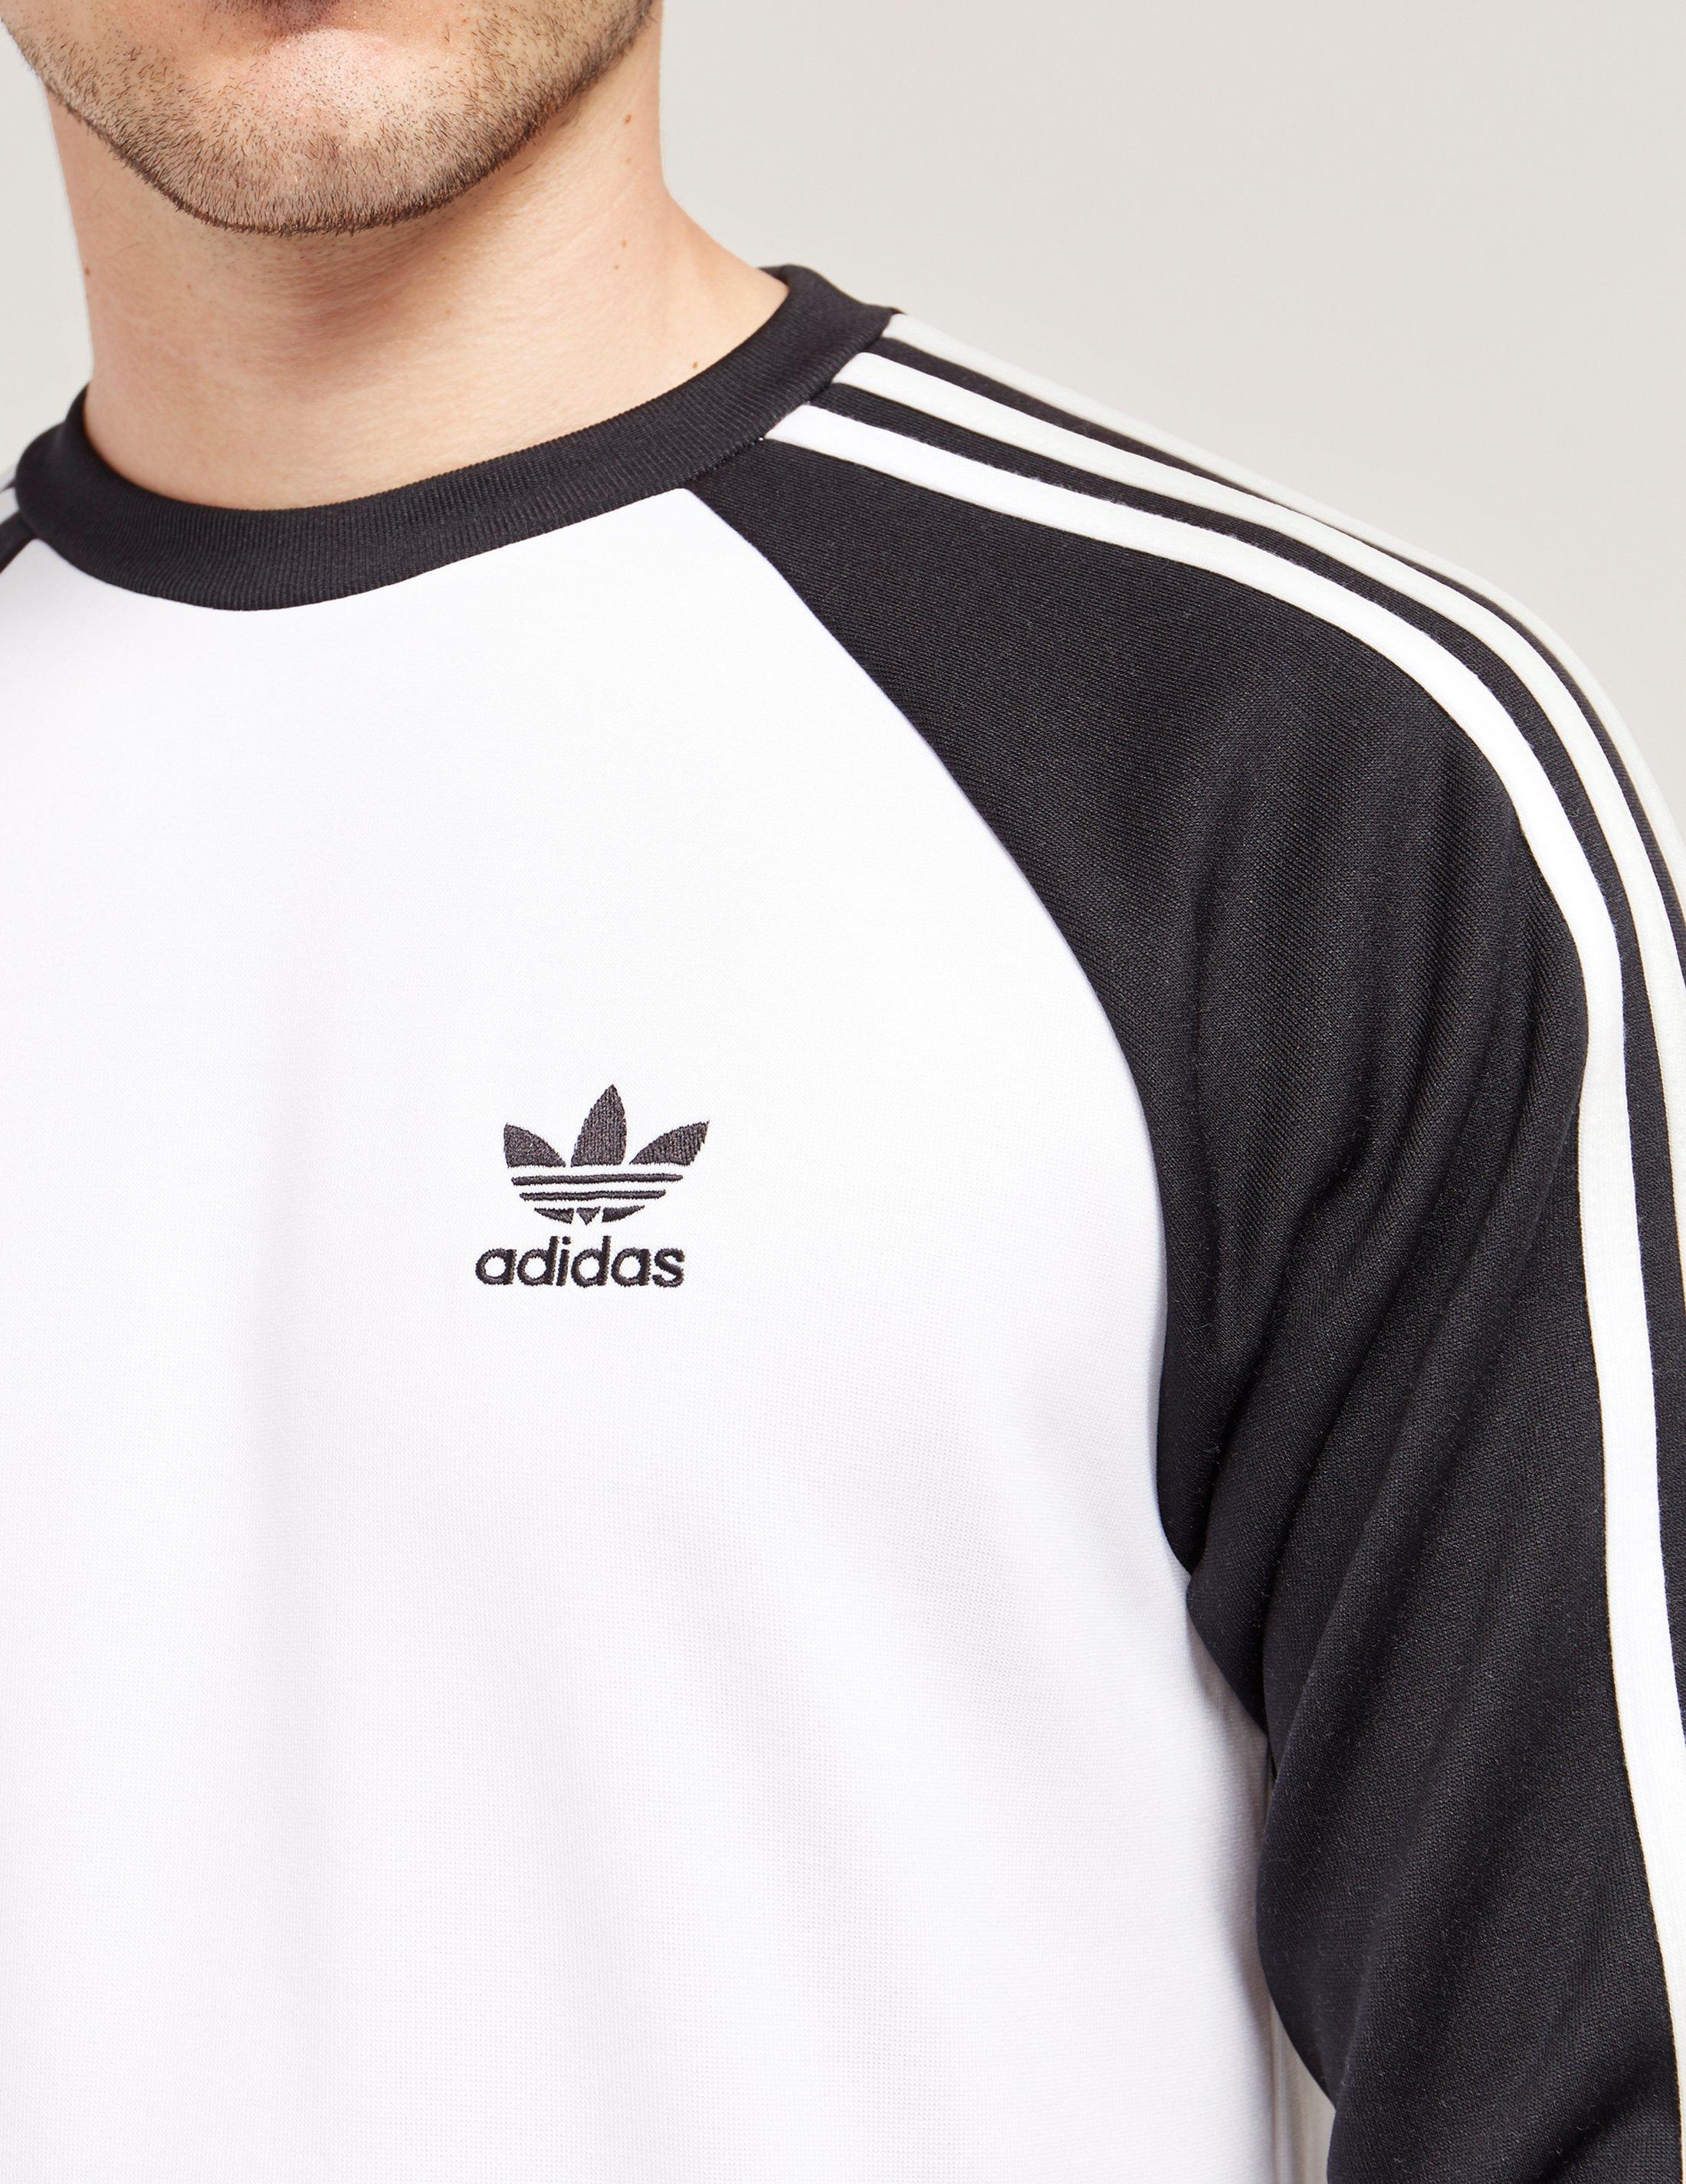 2a1f577172d0 Lyst - adidas Originals Superstar Sweatshirt in Black for Men